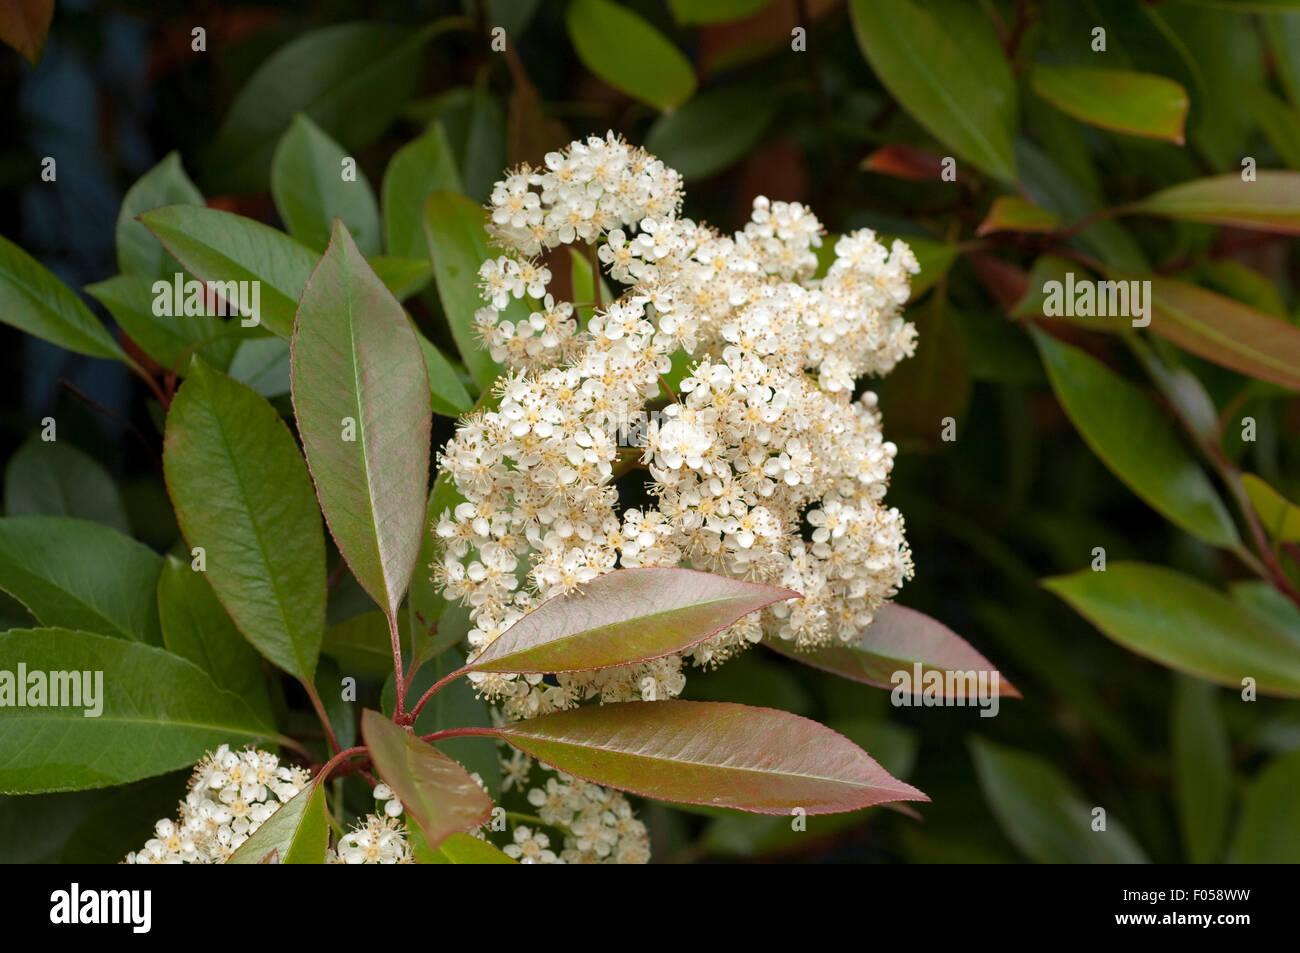 Glanzmispel; Photinia; Stock Photo